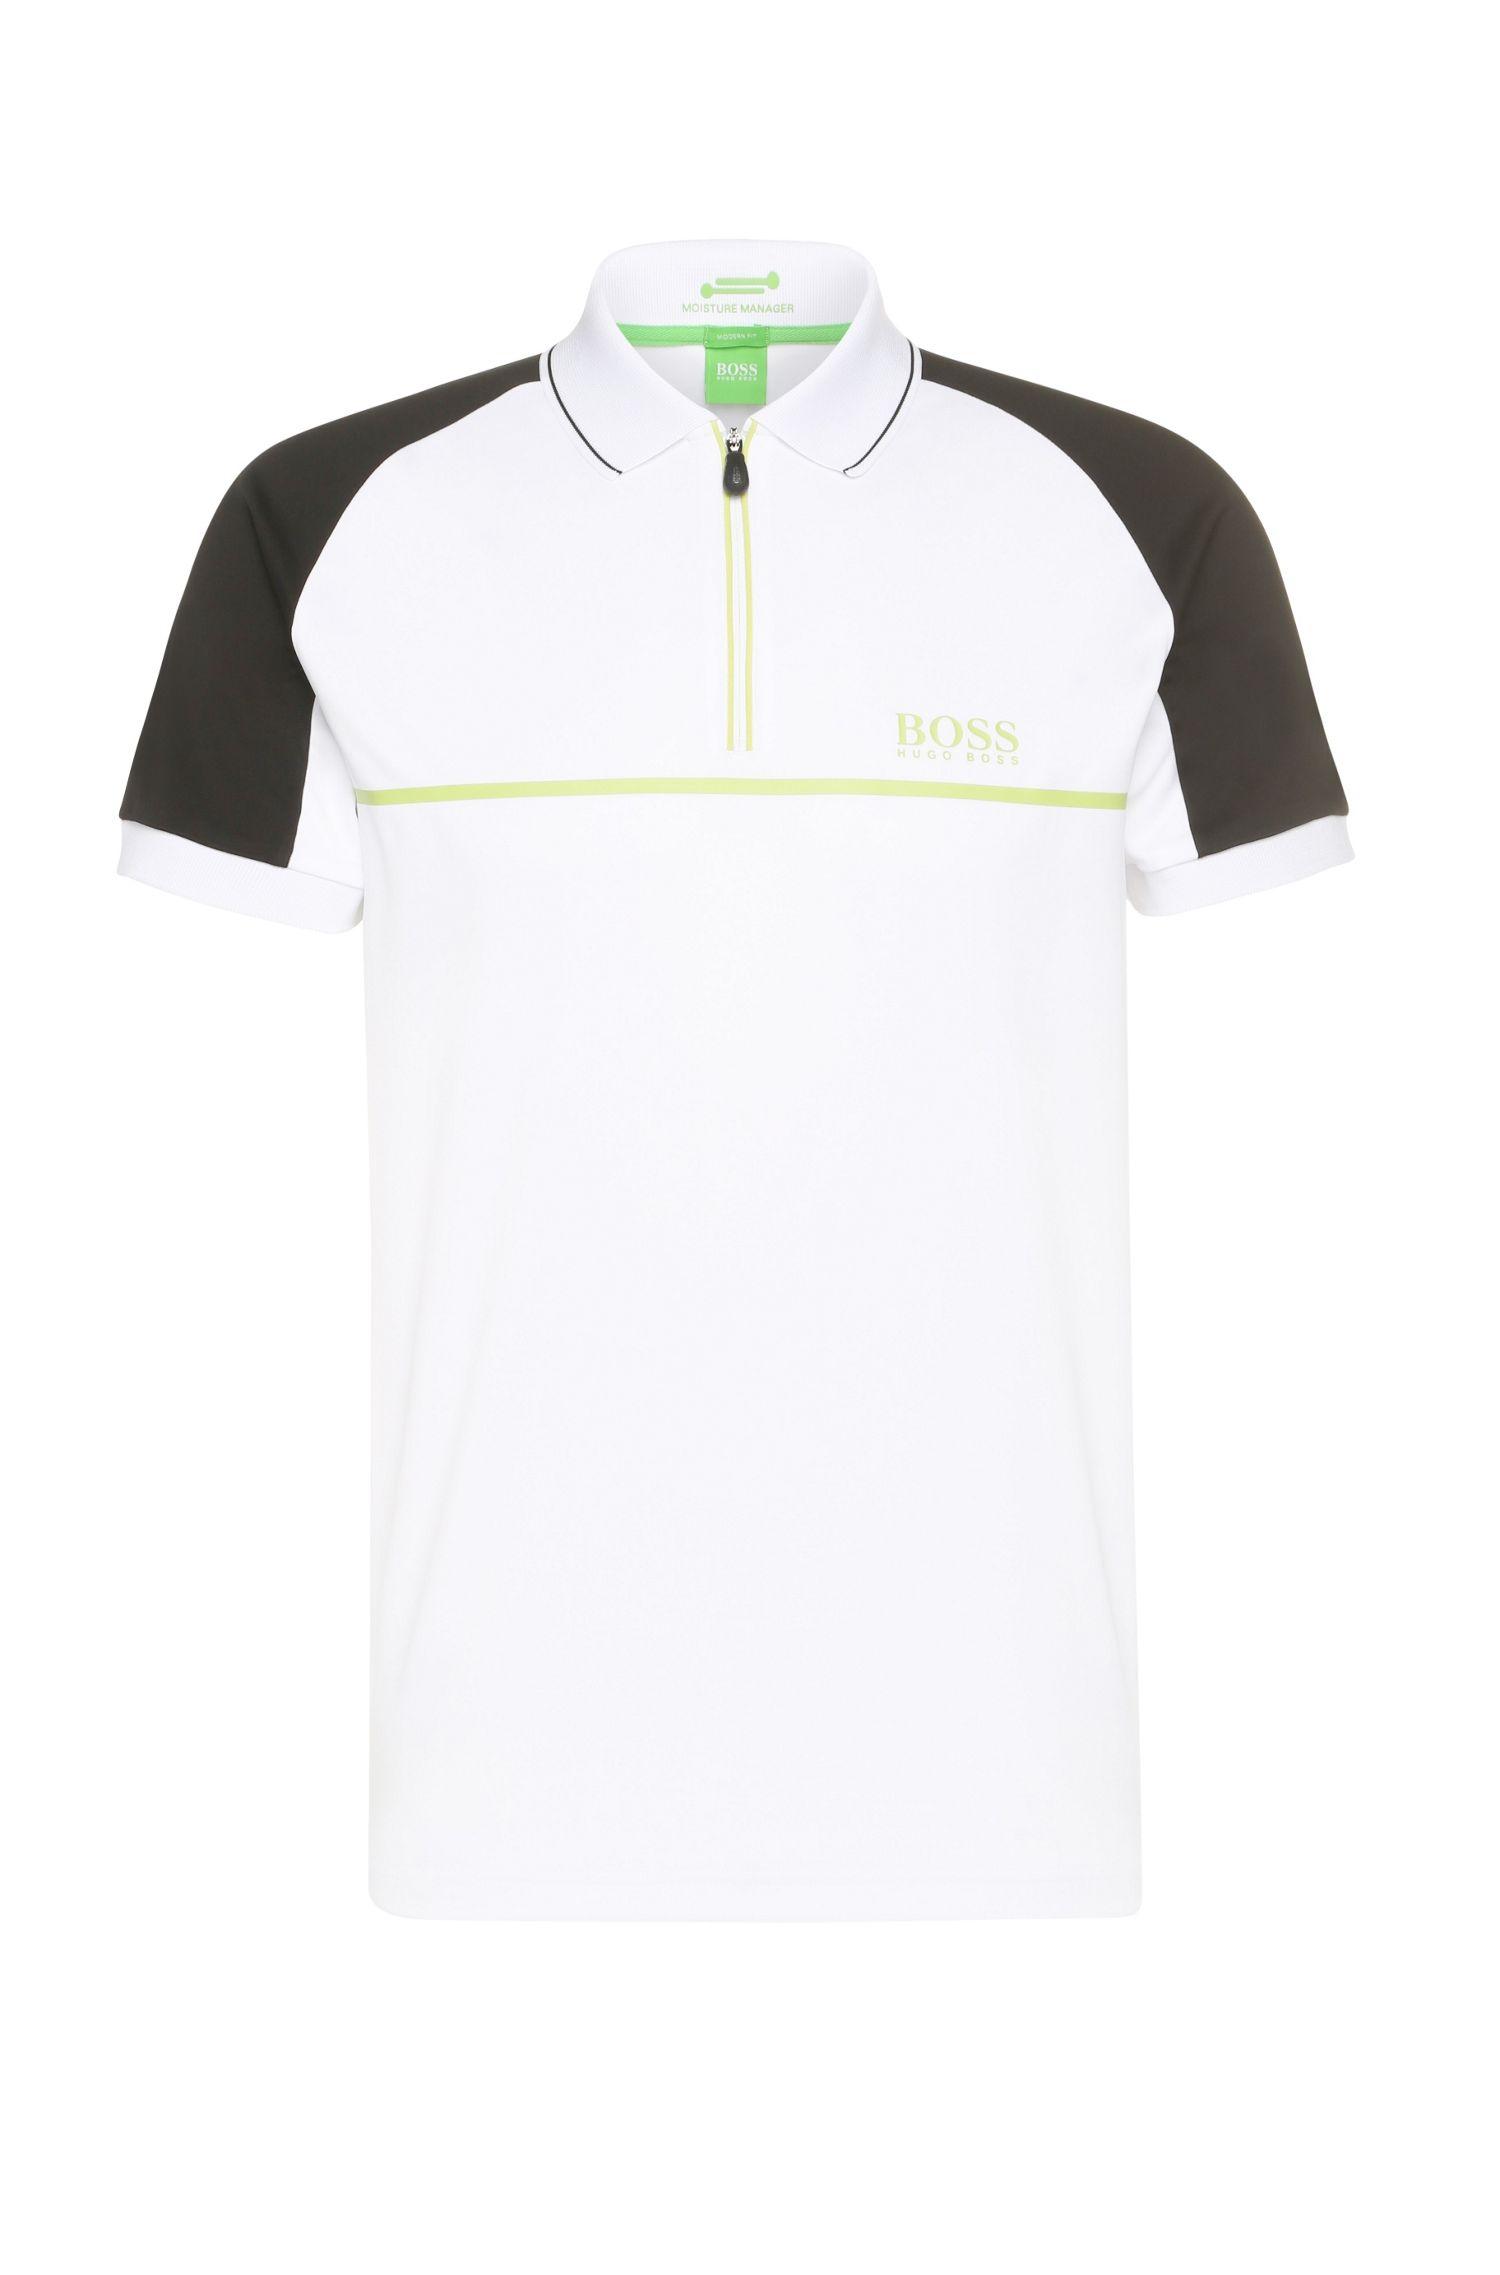 Regular-Fit Poloshirt aus elastischem Funktions-Textil: ´Prek Pro`